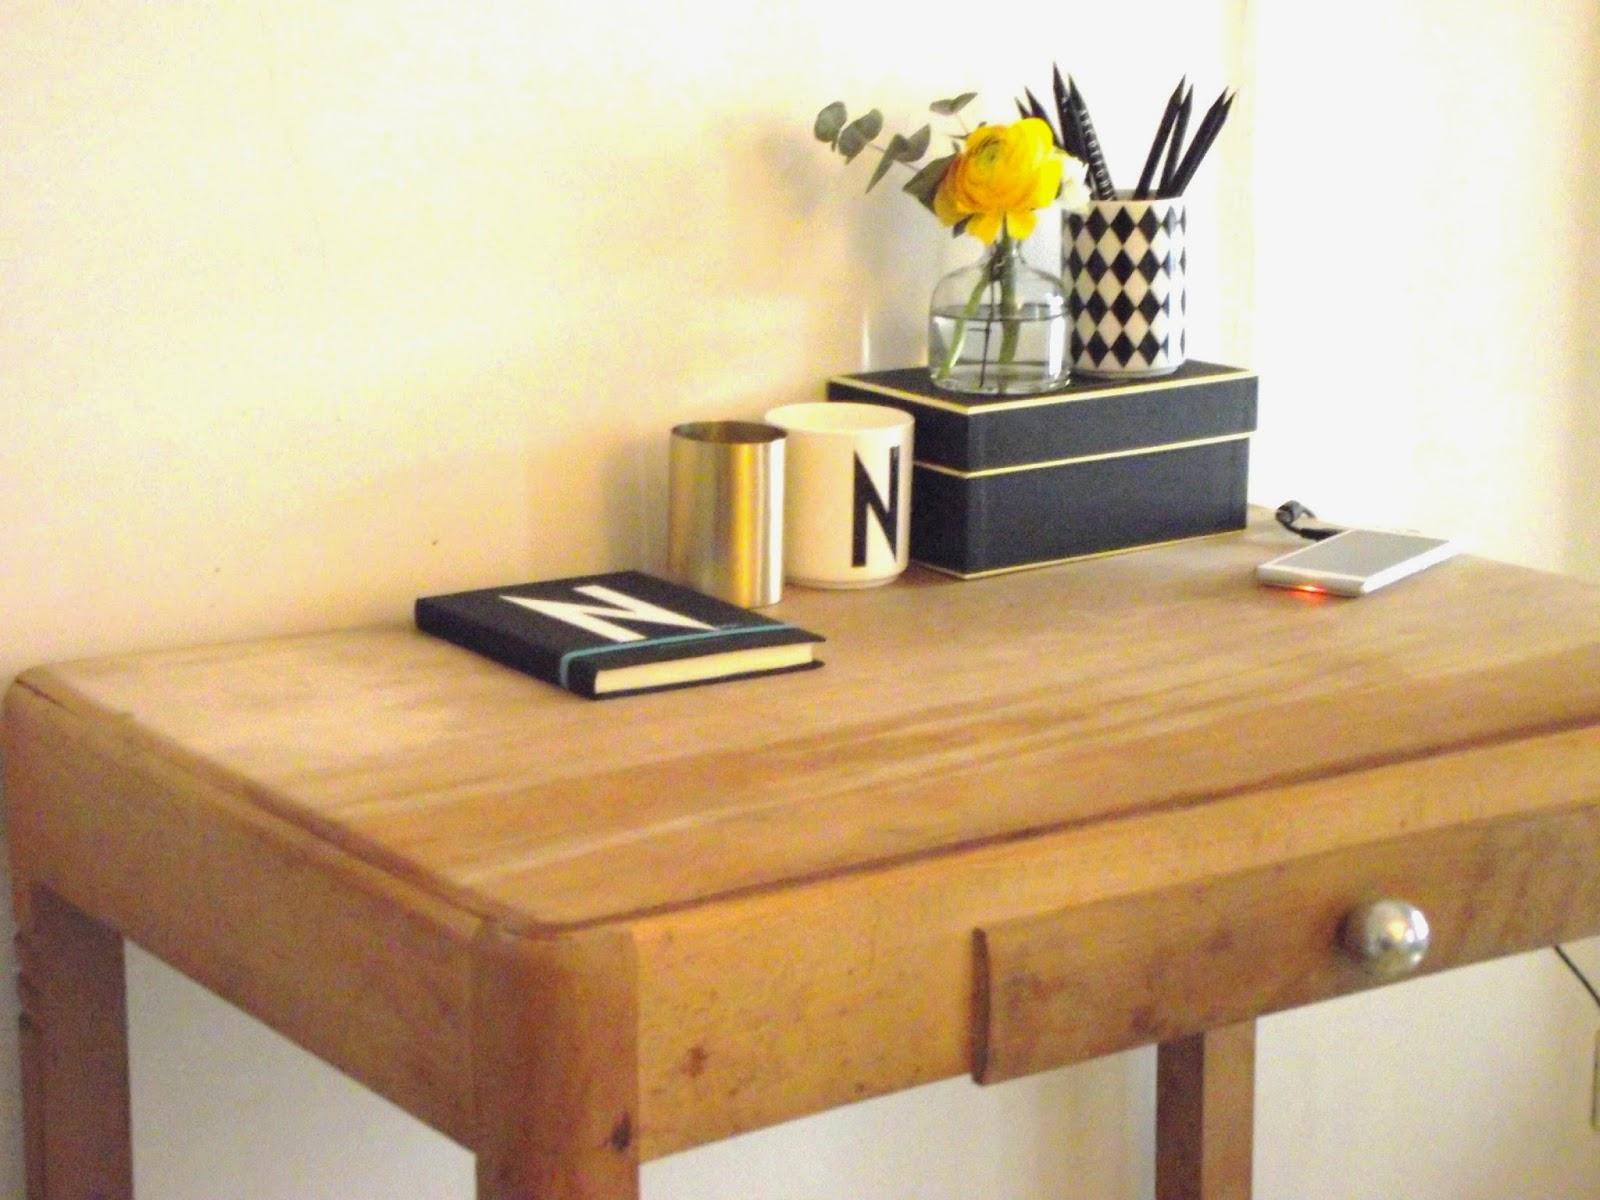 les petits meubles de marie robert et moi nalou 39 s in. Black Bedroom Furniture Sets. Home Design Ideas